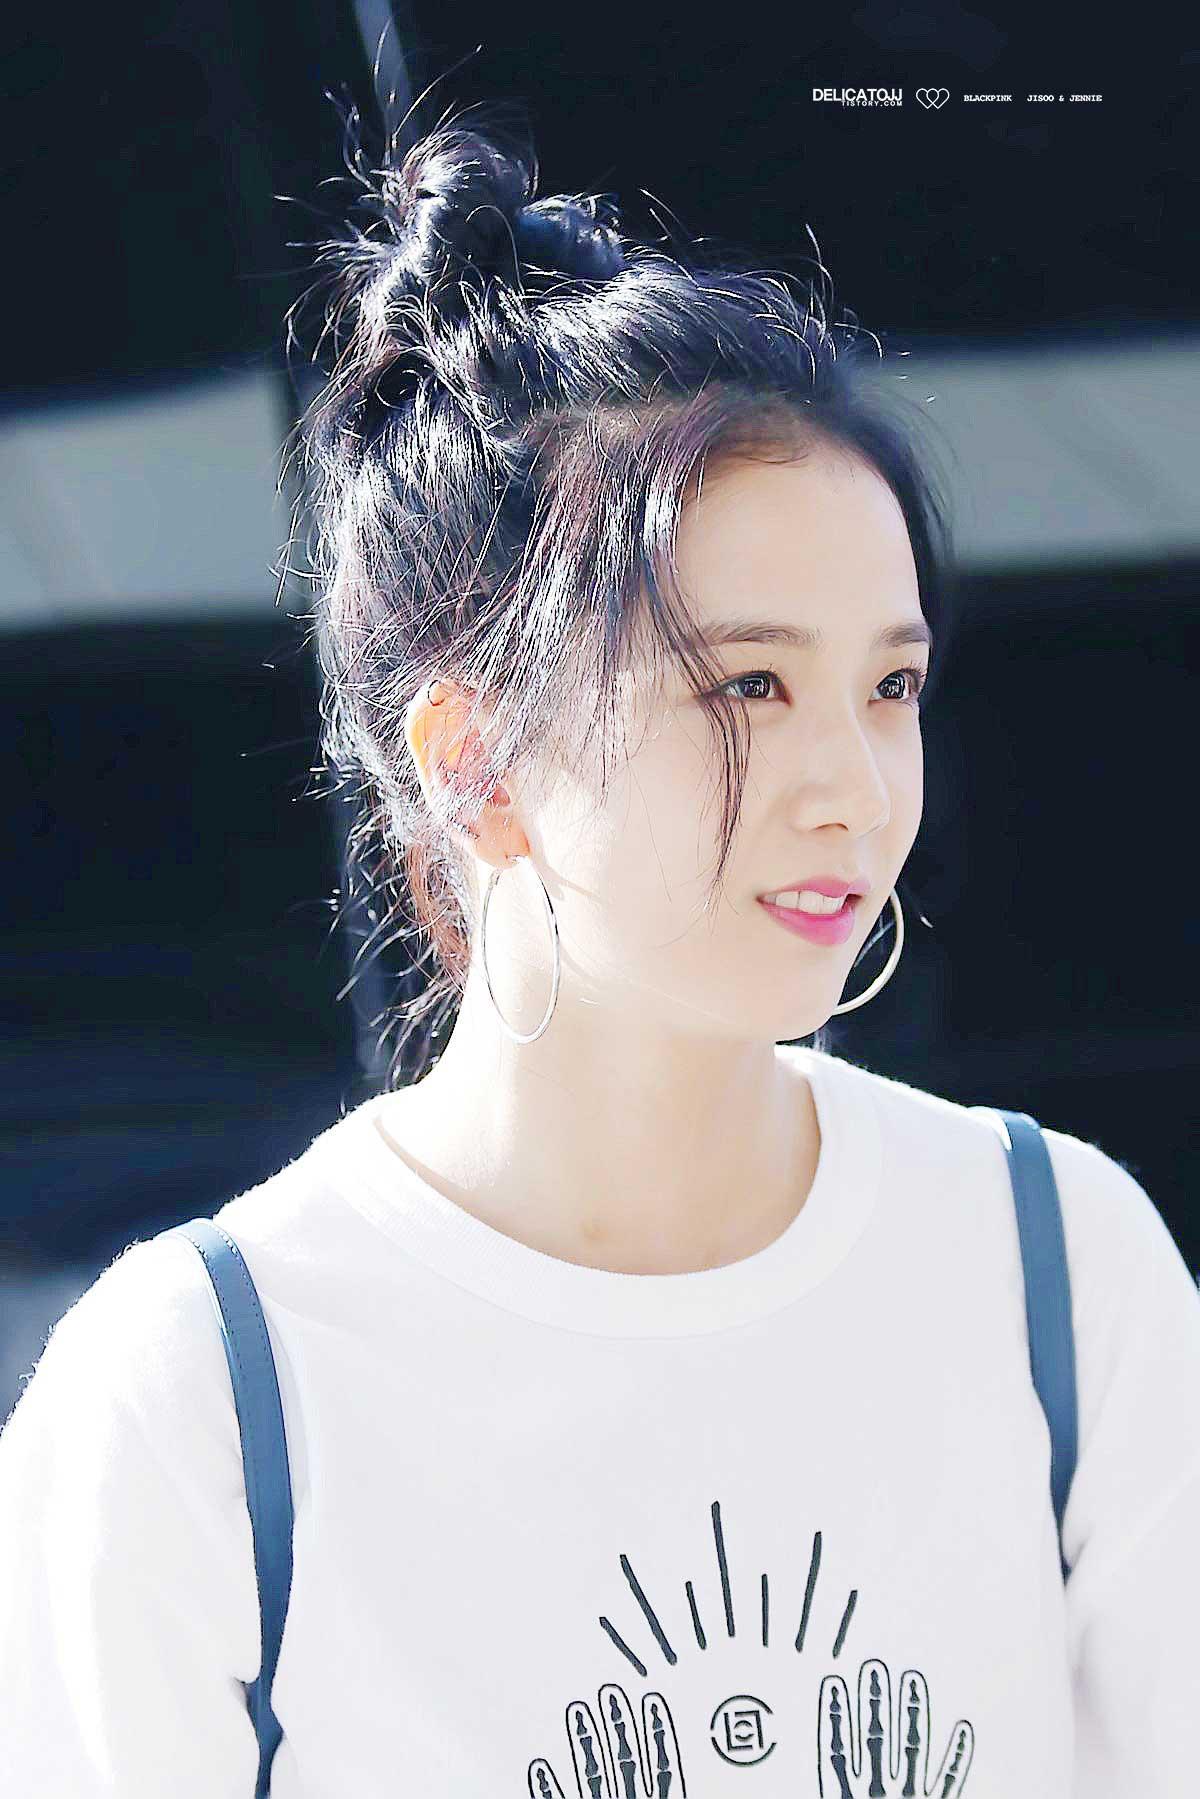 blackpink-jisoo-top-knot-bun-hairstyle